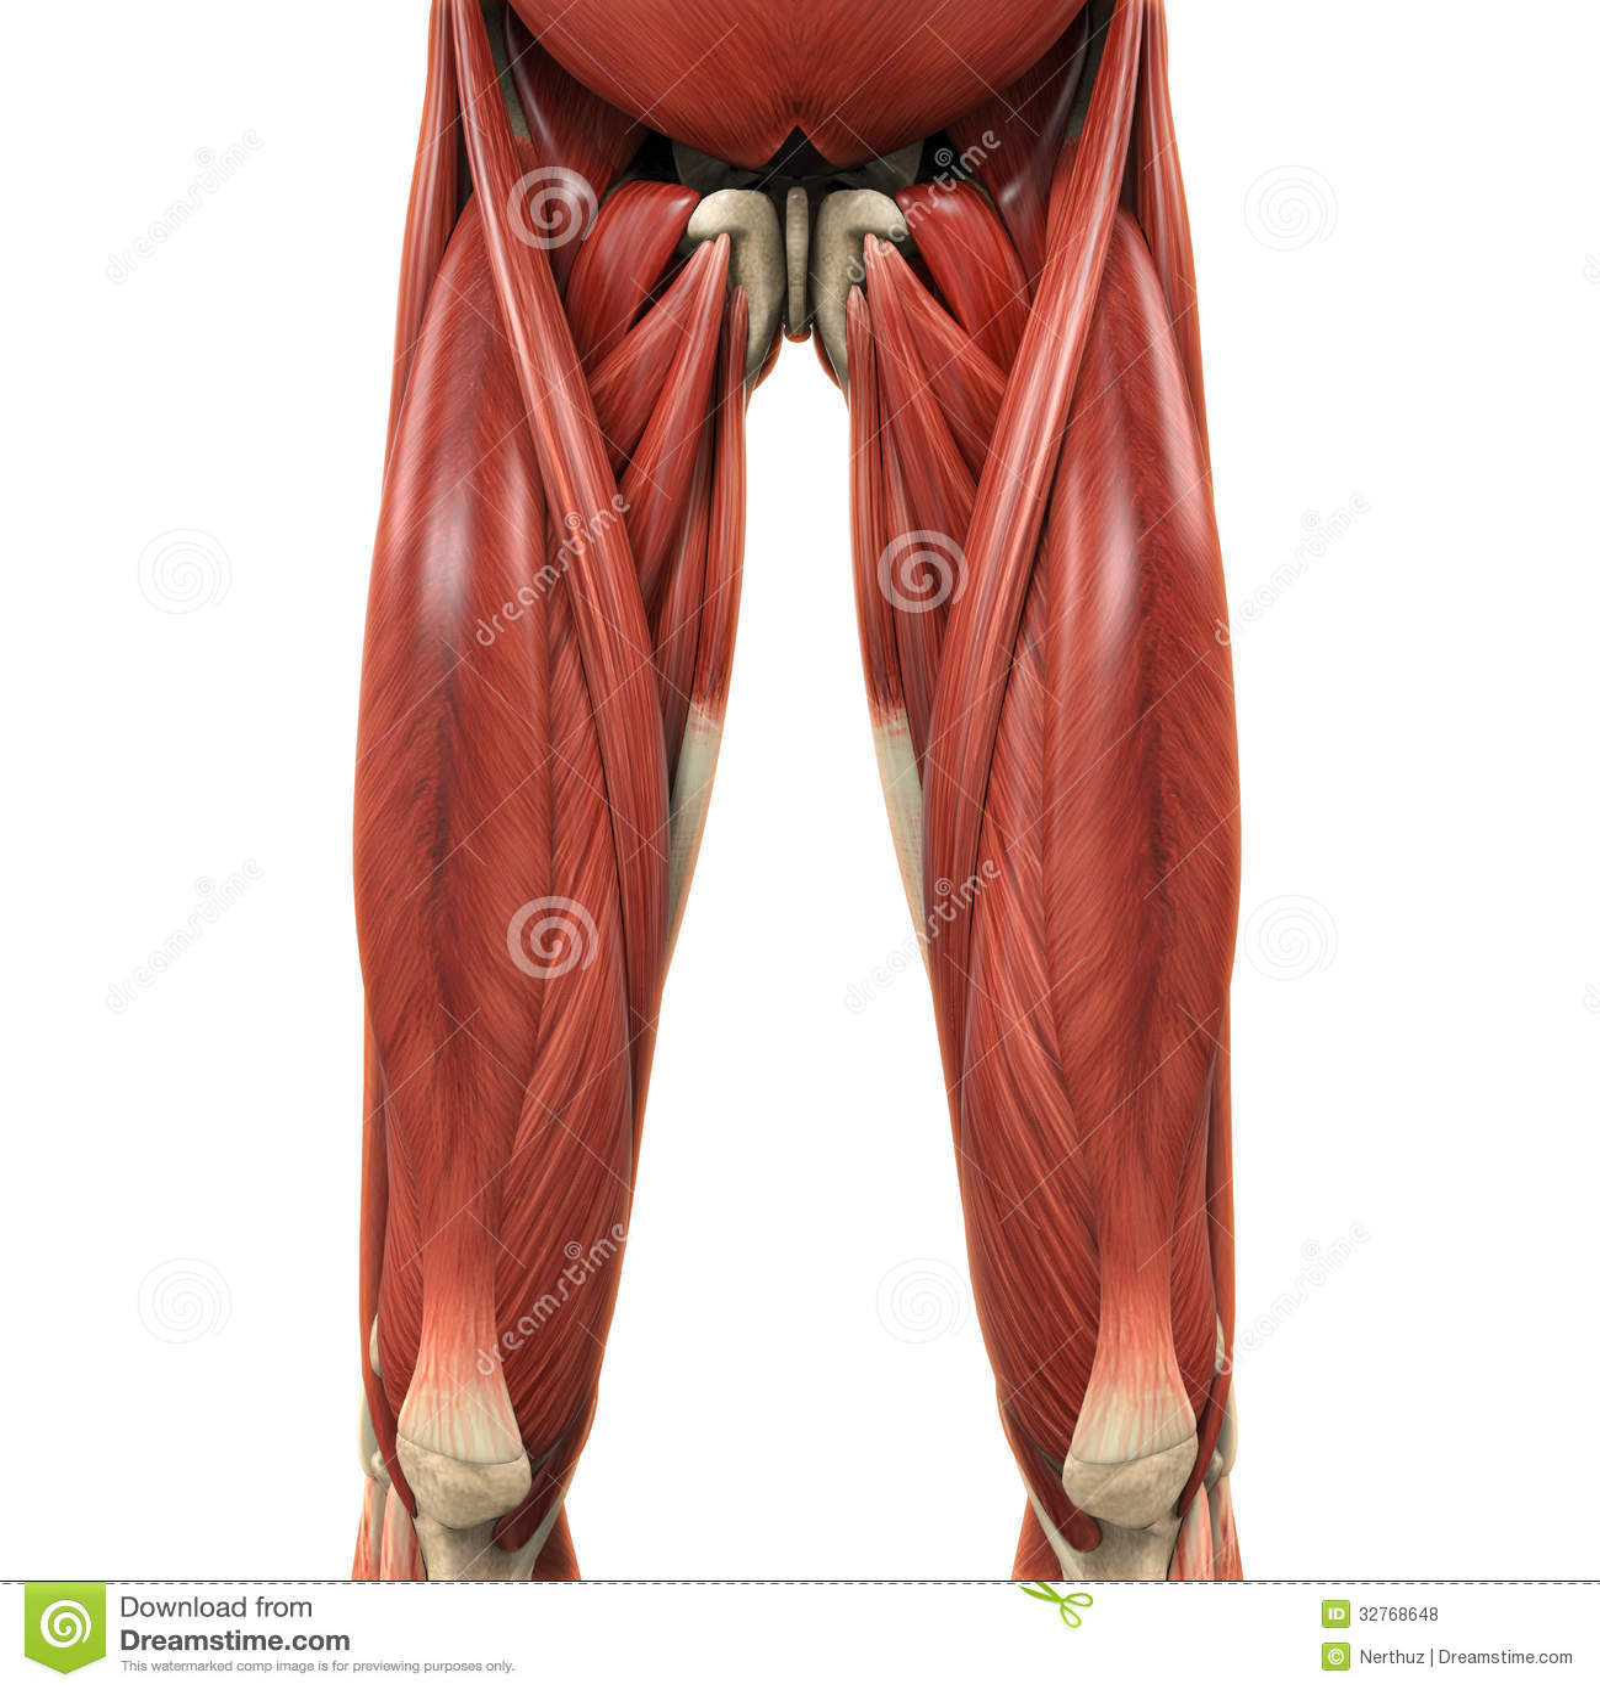 Upper Legs Muscles Anatomy stock illustration. Illustration of ...